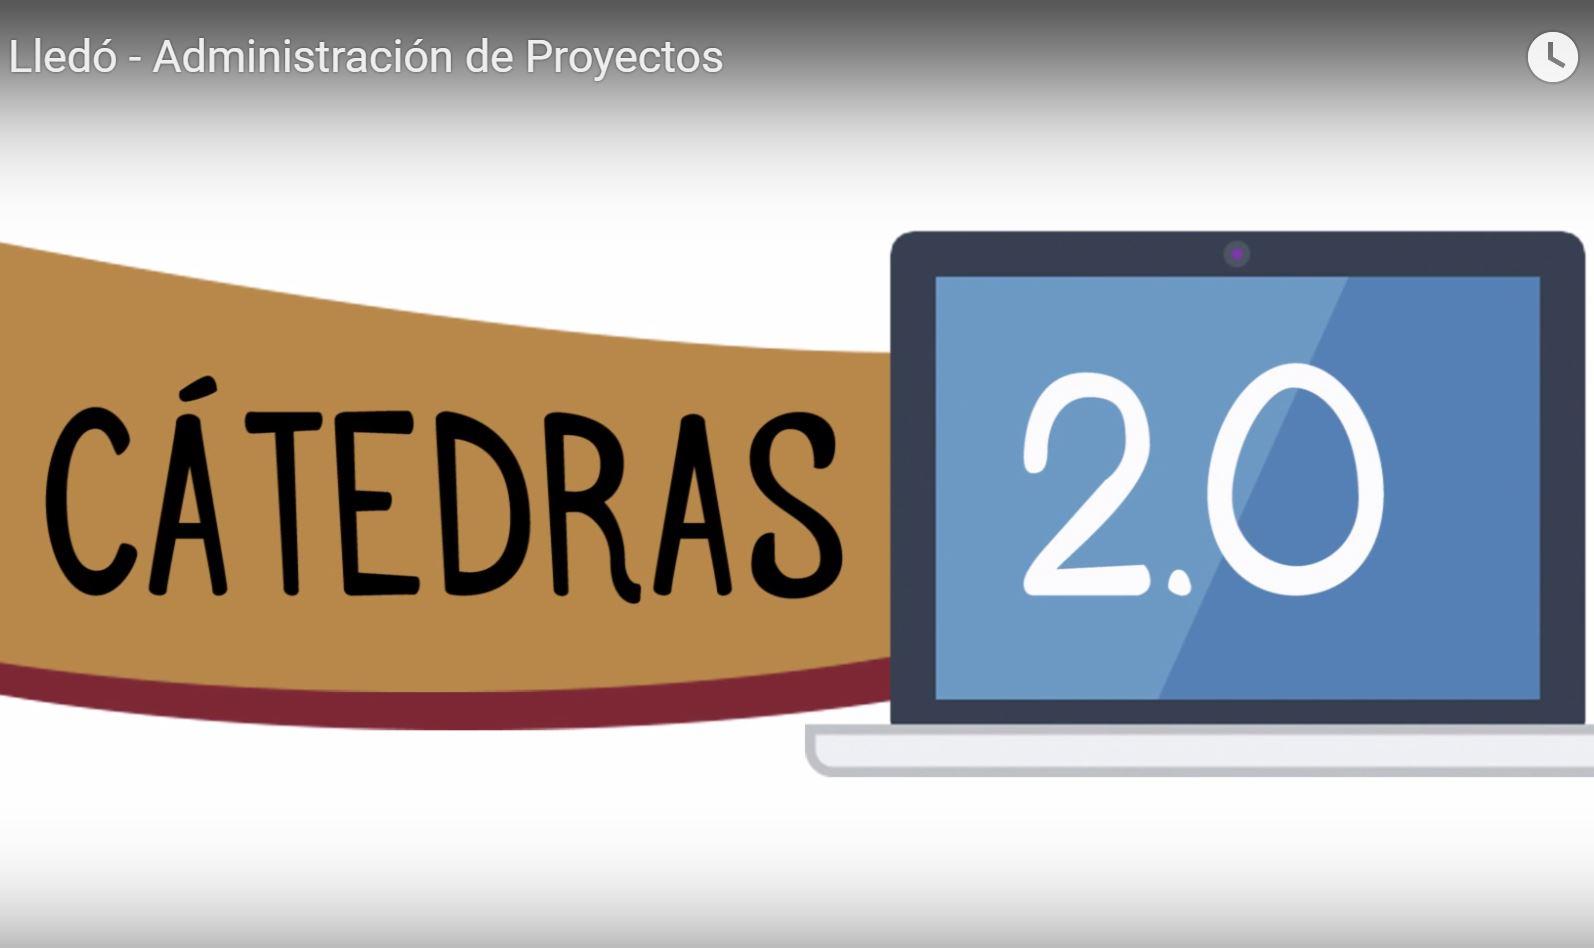 c-tedras-2.0.jpg